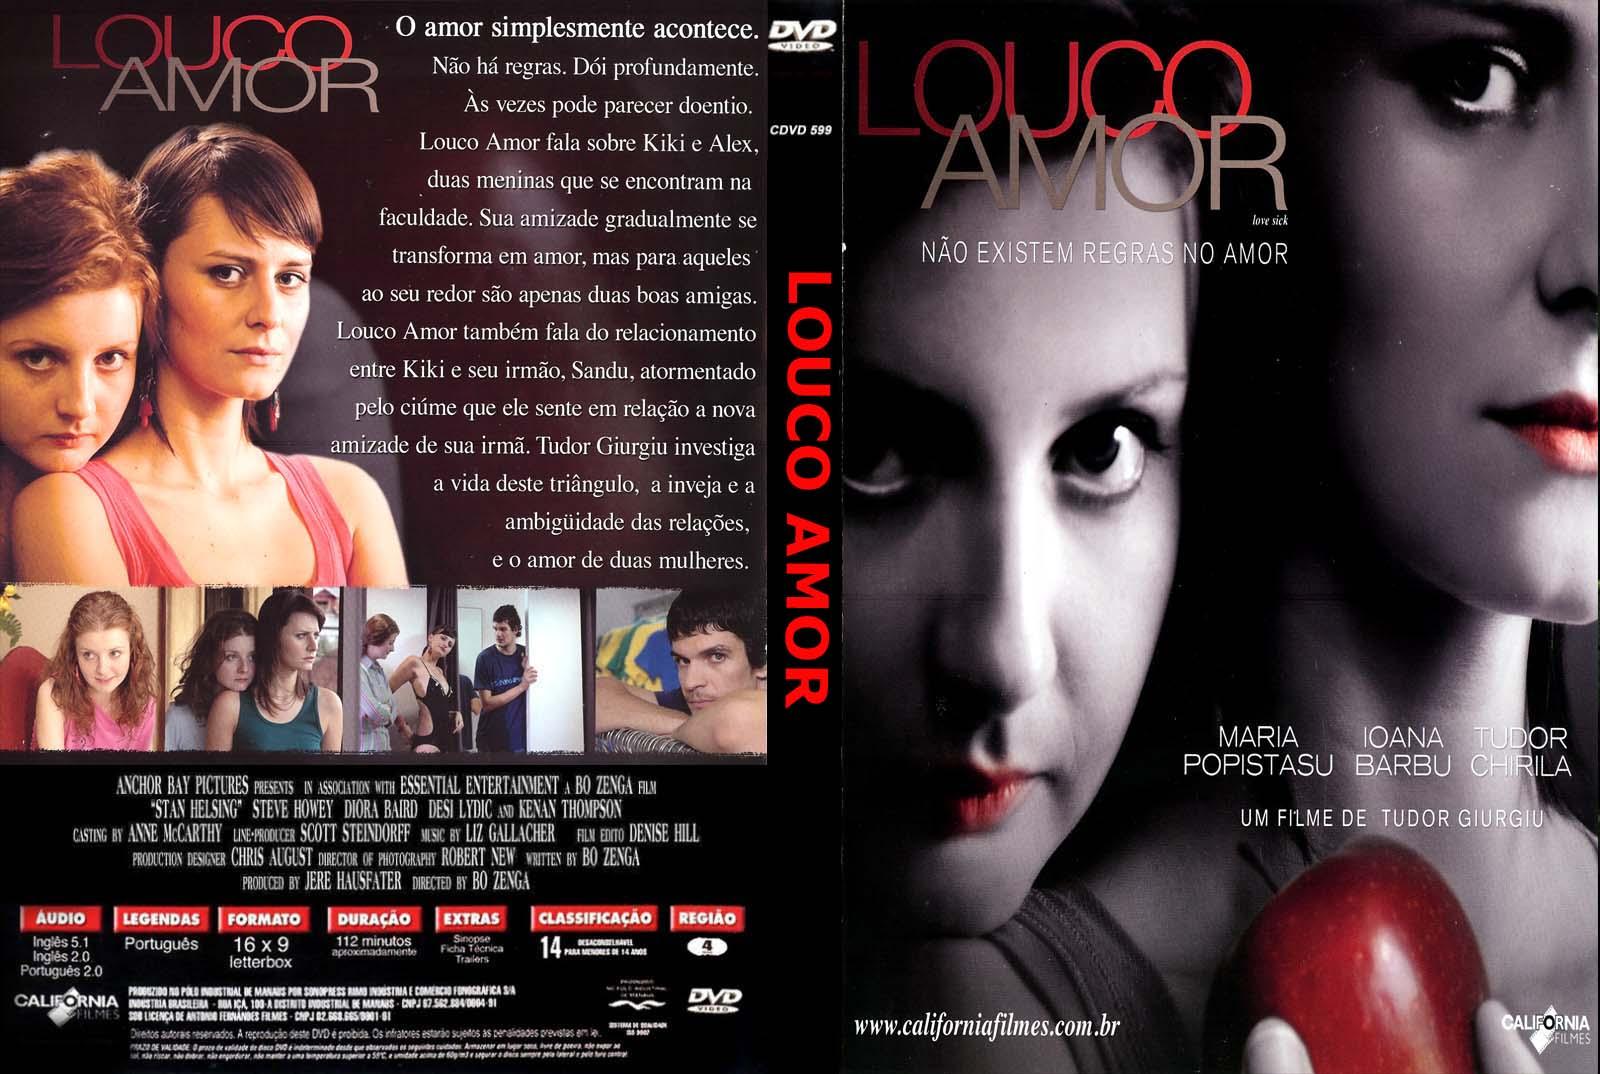 Louco Amor movie